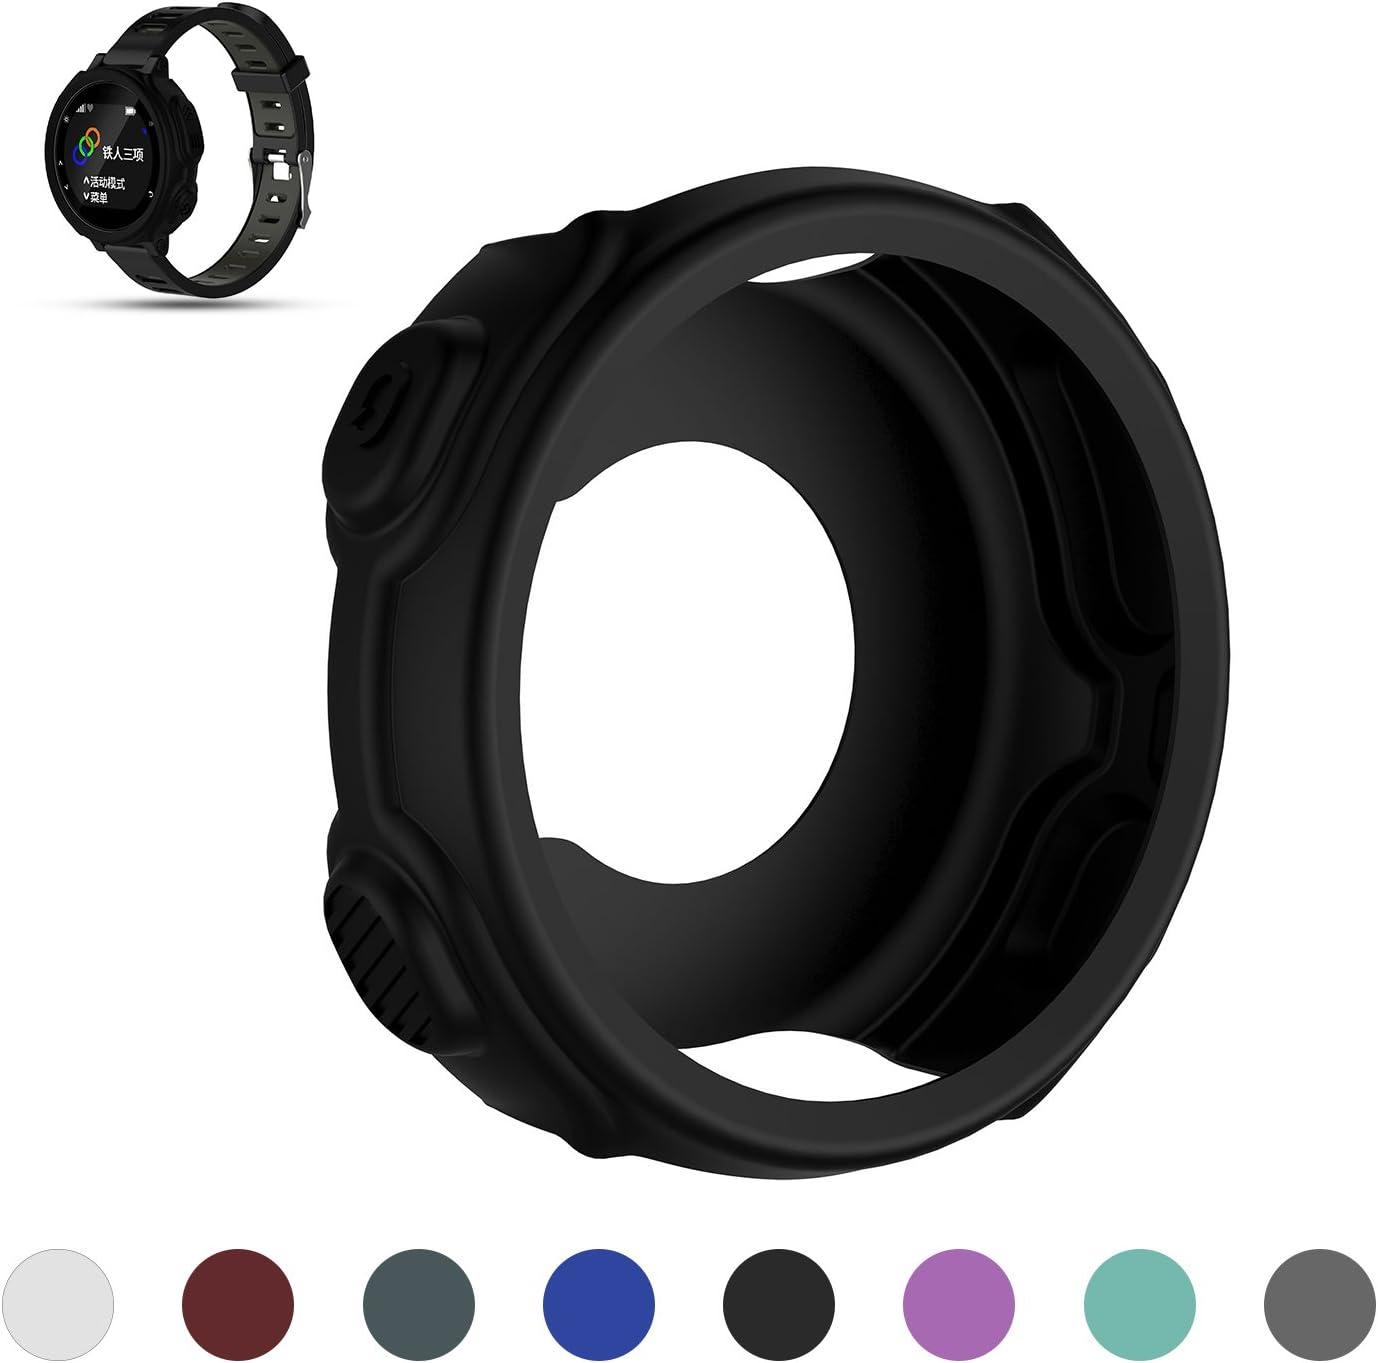 Protector de iFeeker, para Garmin Forerrunner 235/735XT, de silicona suave, resistente a los golpes